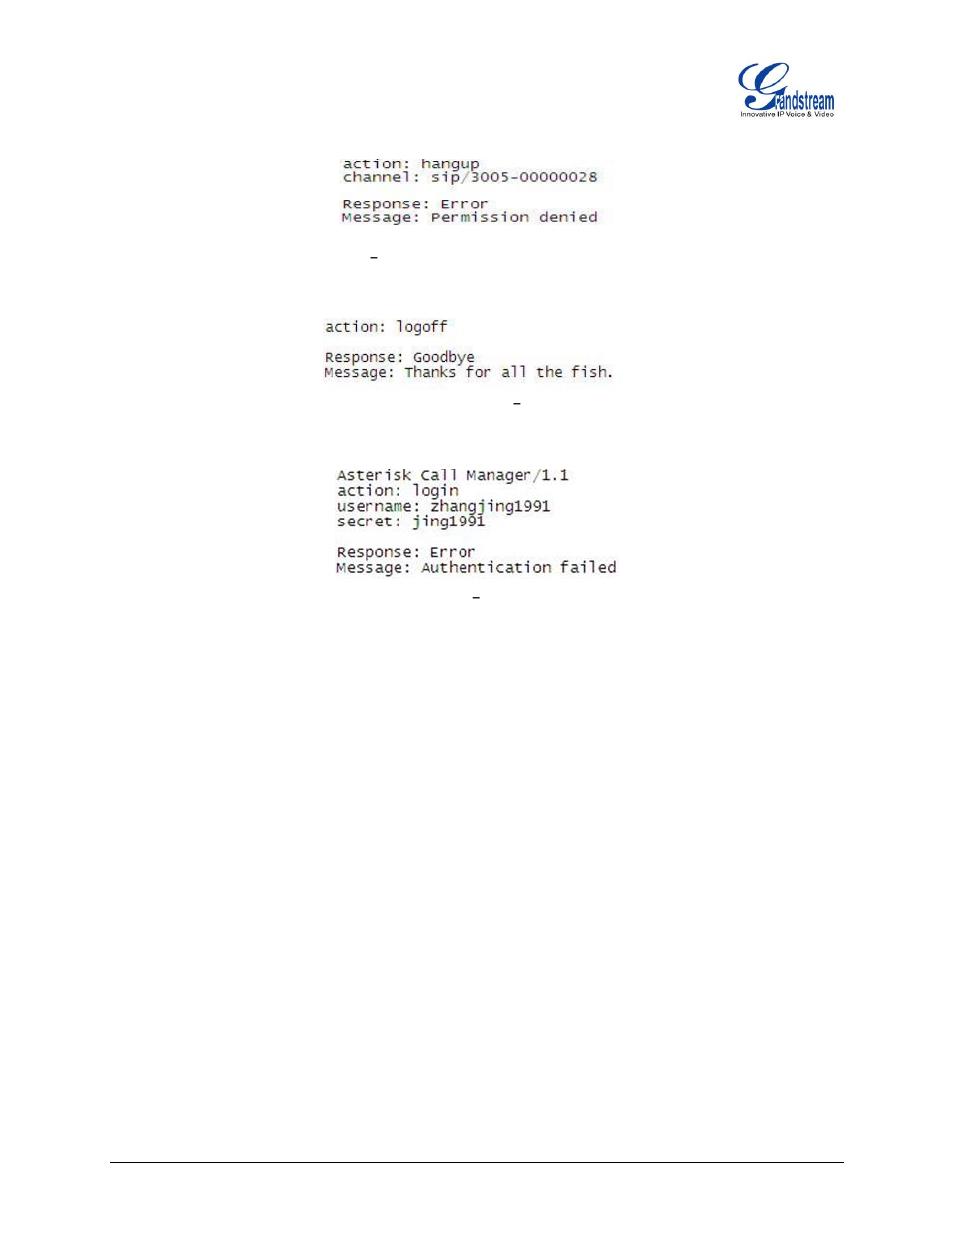 Figure 14: example 3, Figure 15: example 4, Log off